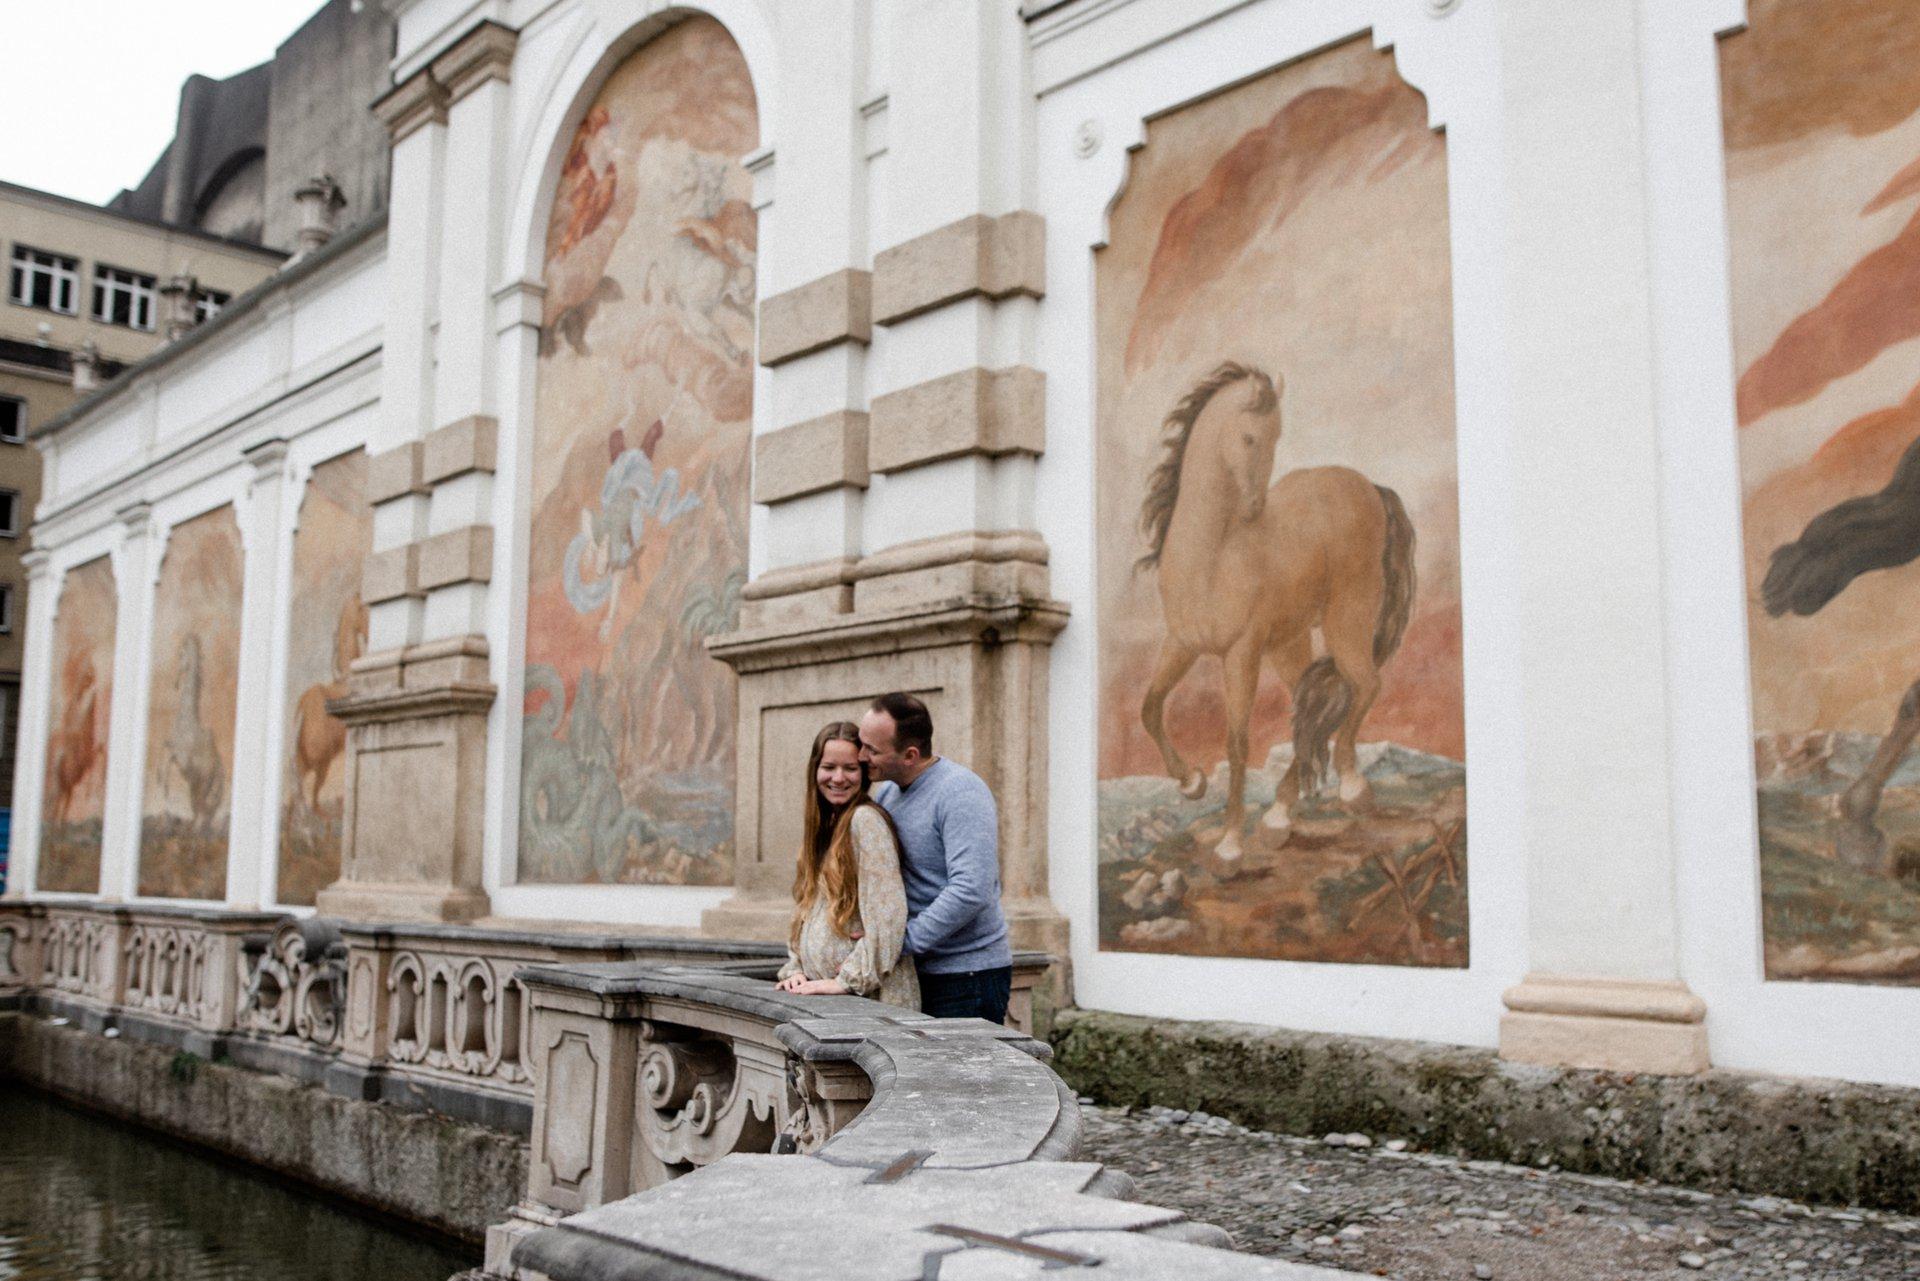 Salzburg-Austria-travel-story-Flytographer-5